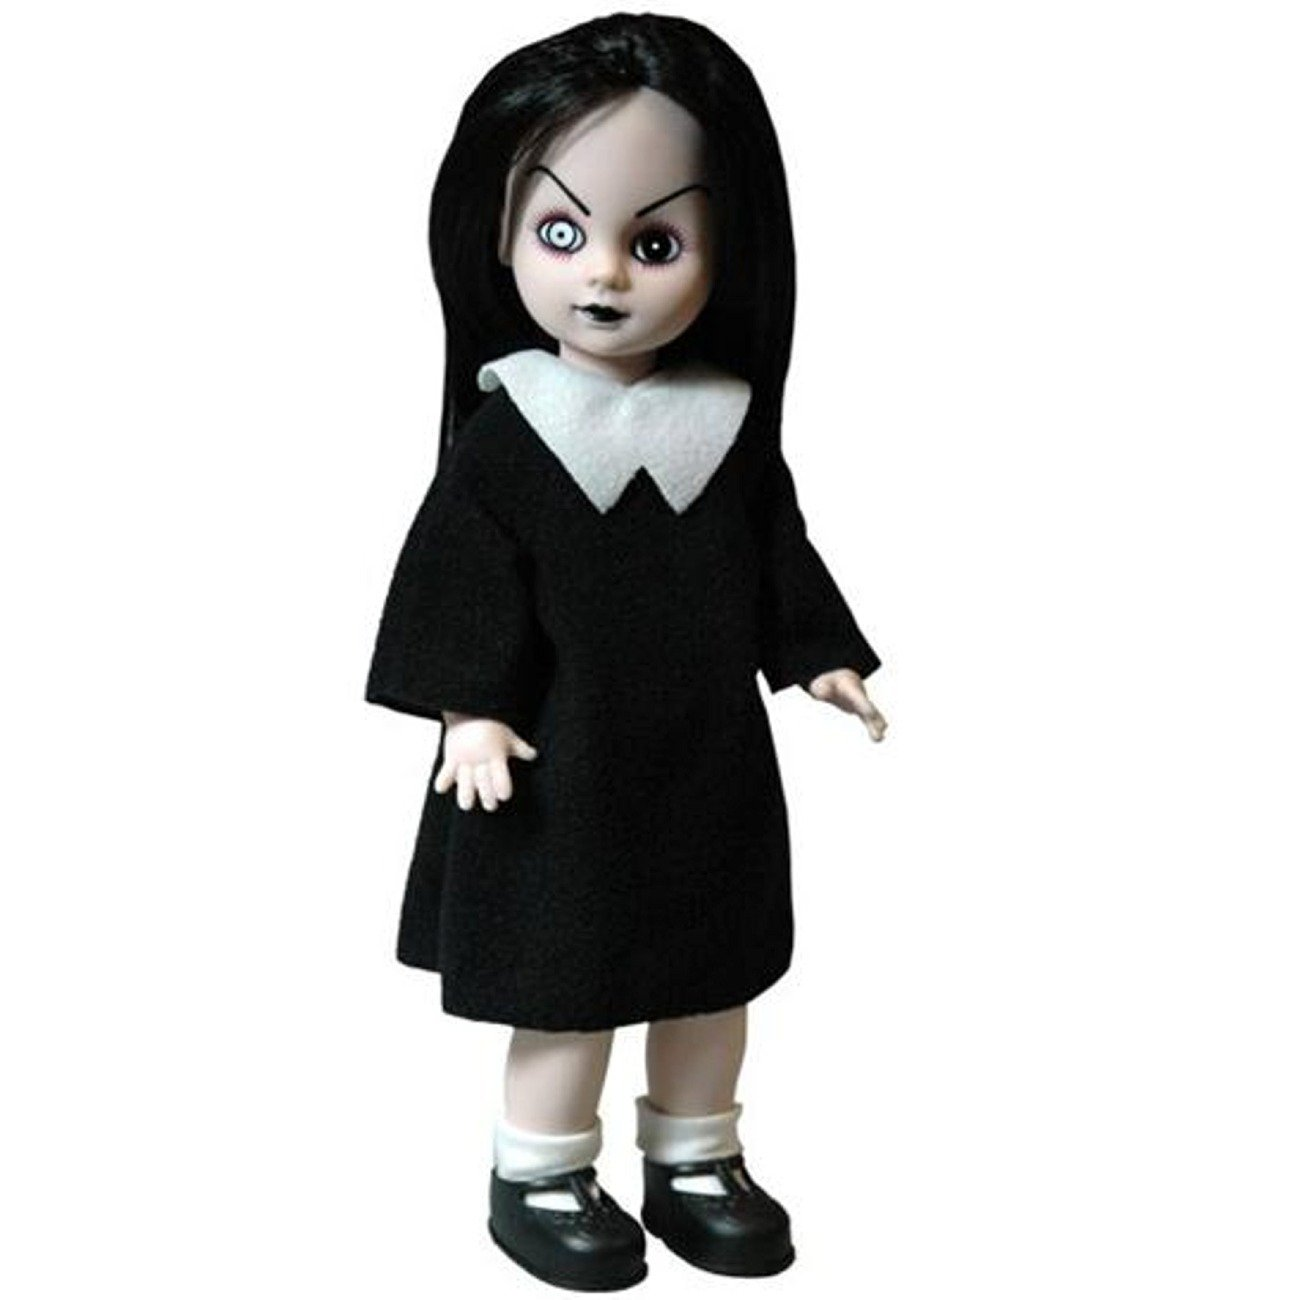 SALE  Living Dead Dolls (Living Dead Dolls) 13 Anniversary Series 1 Sadie (japan import)